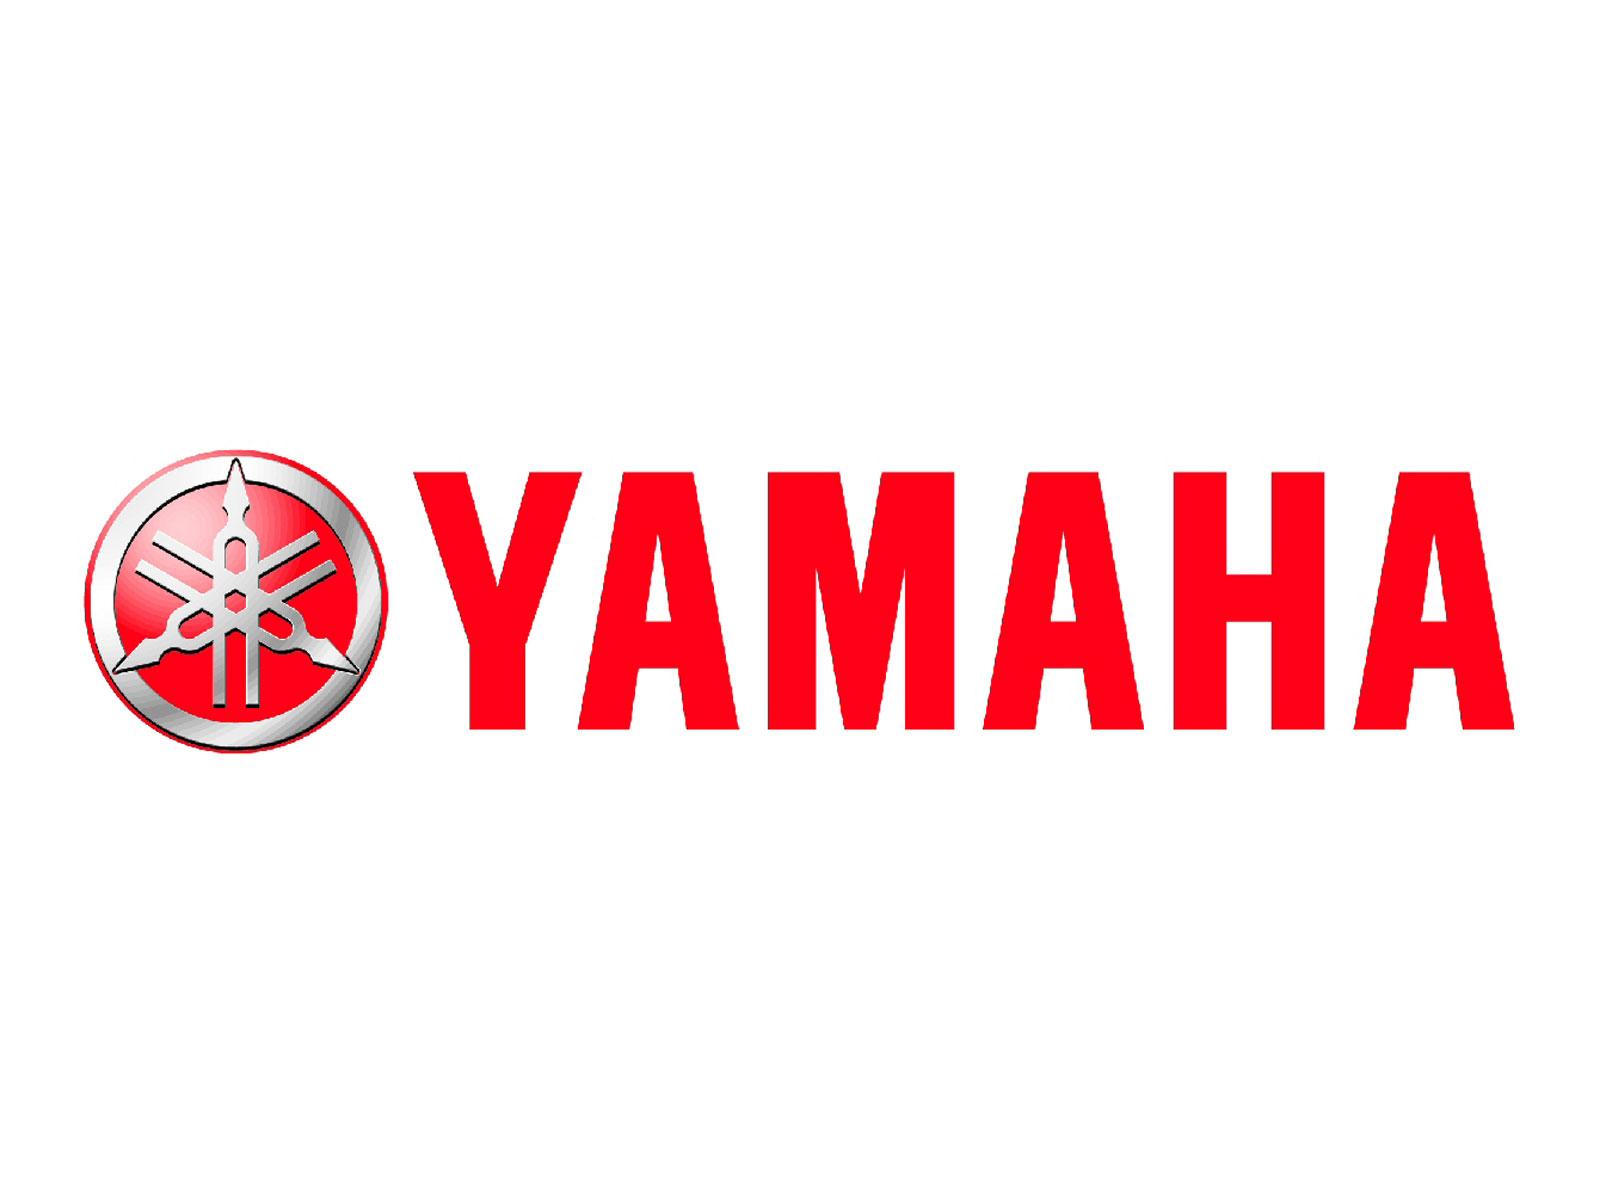 Yamaha Logo Wallpaper Especially